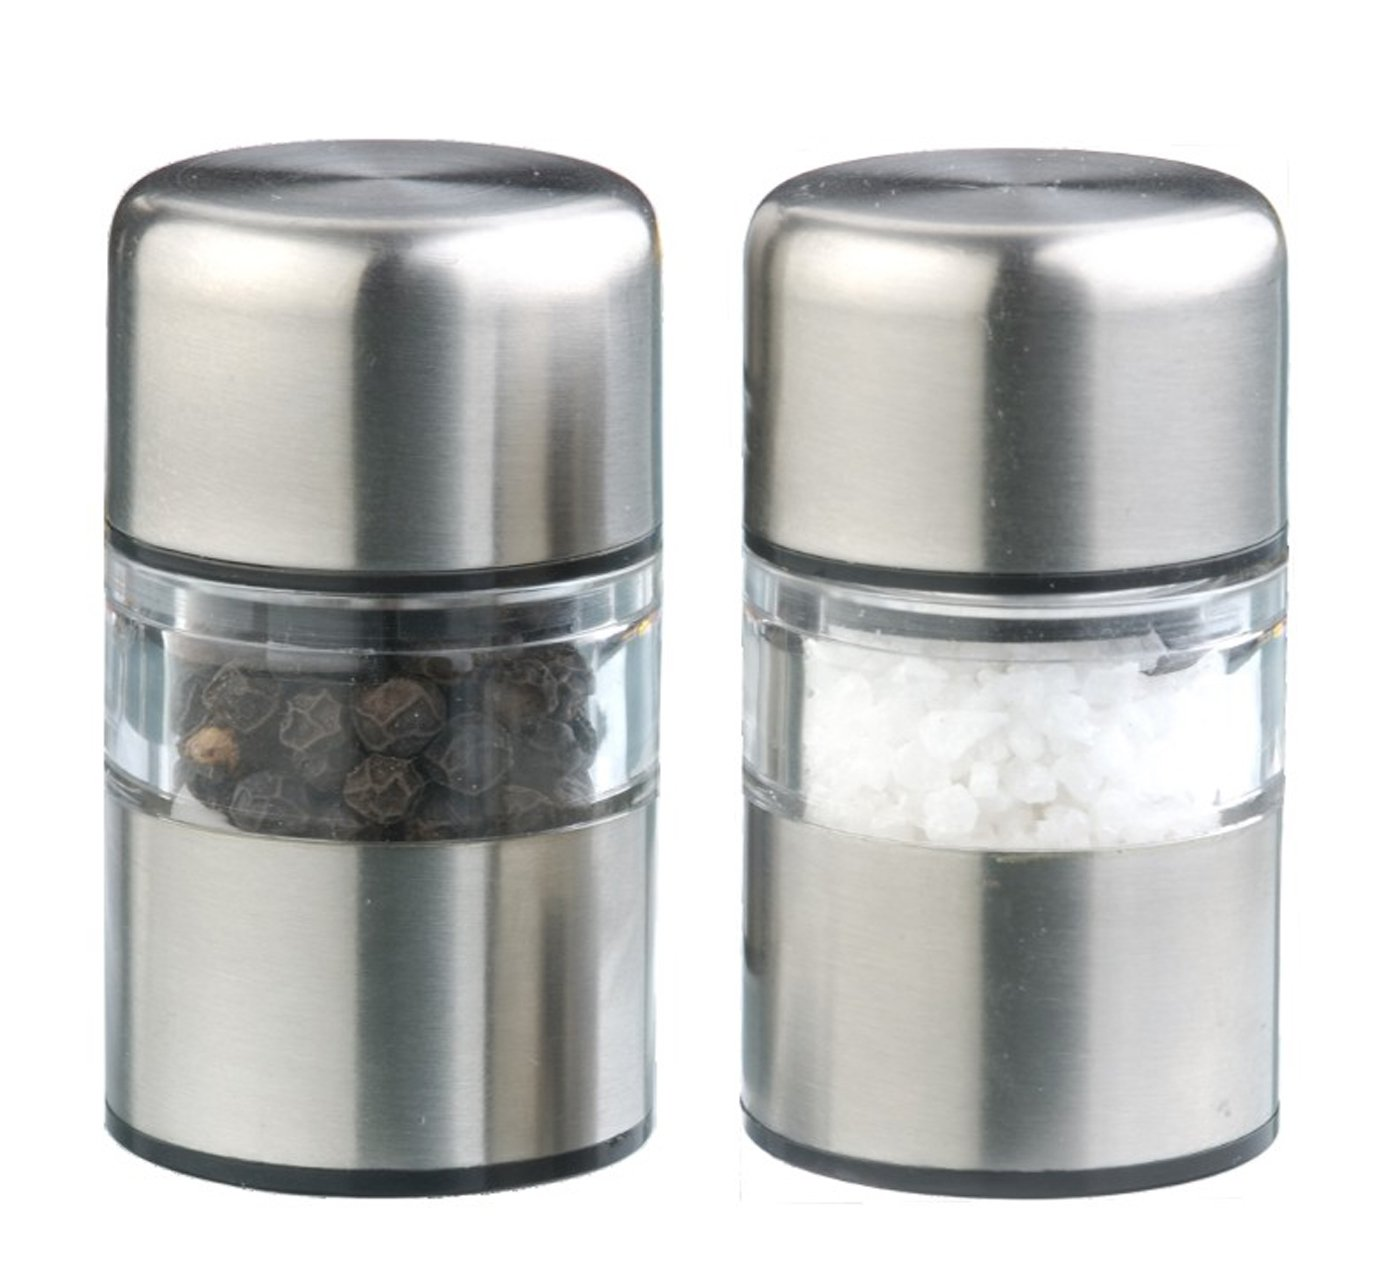 DMD Stainless Steel Mini Gem Salt and Pepper Mill Set DM1001106991SET